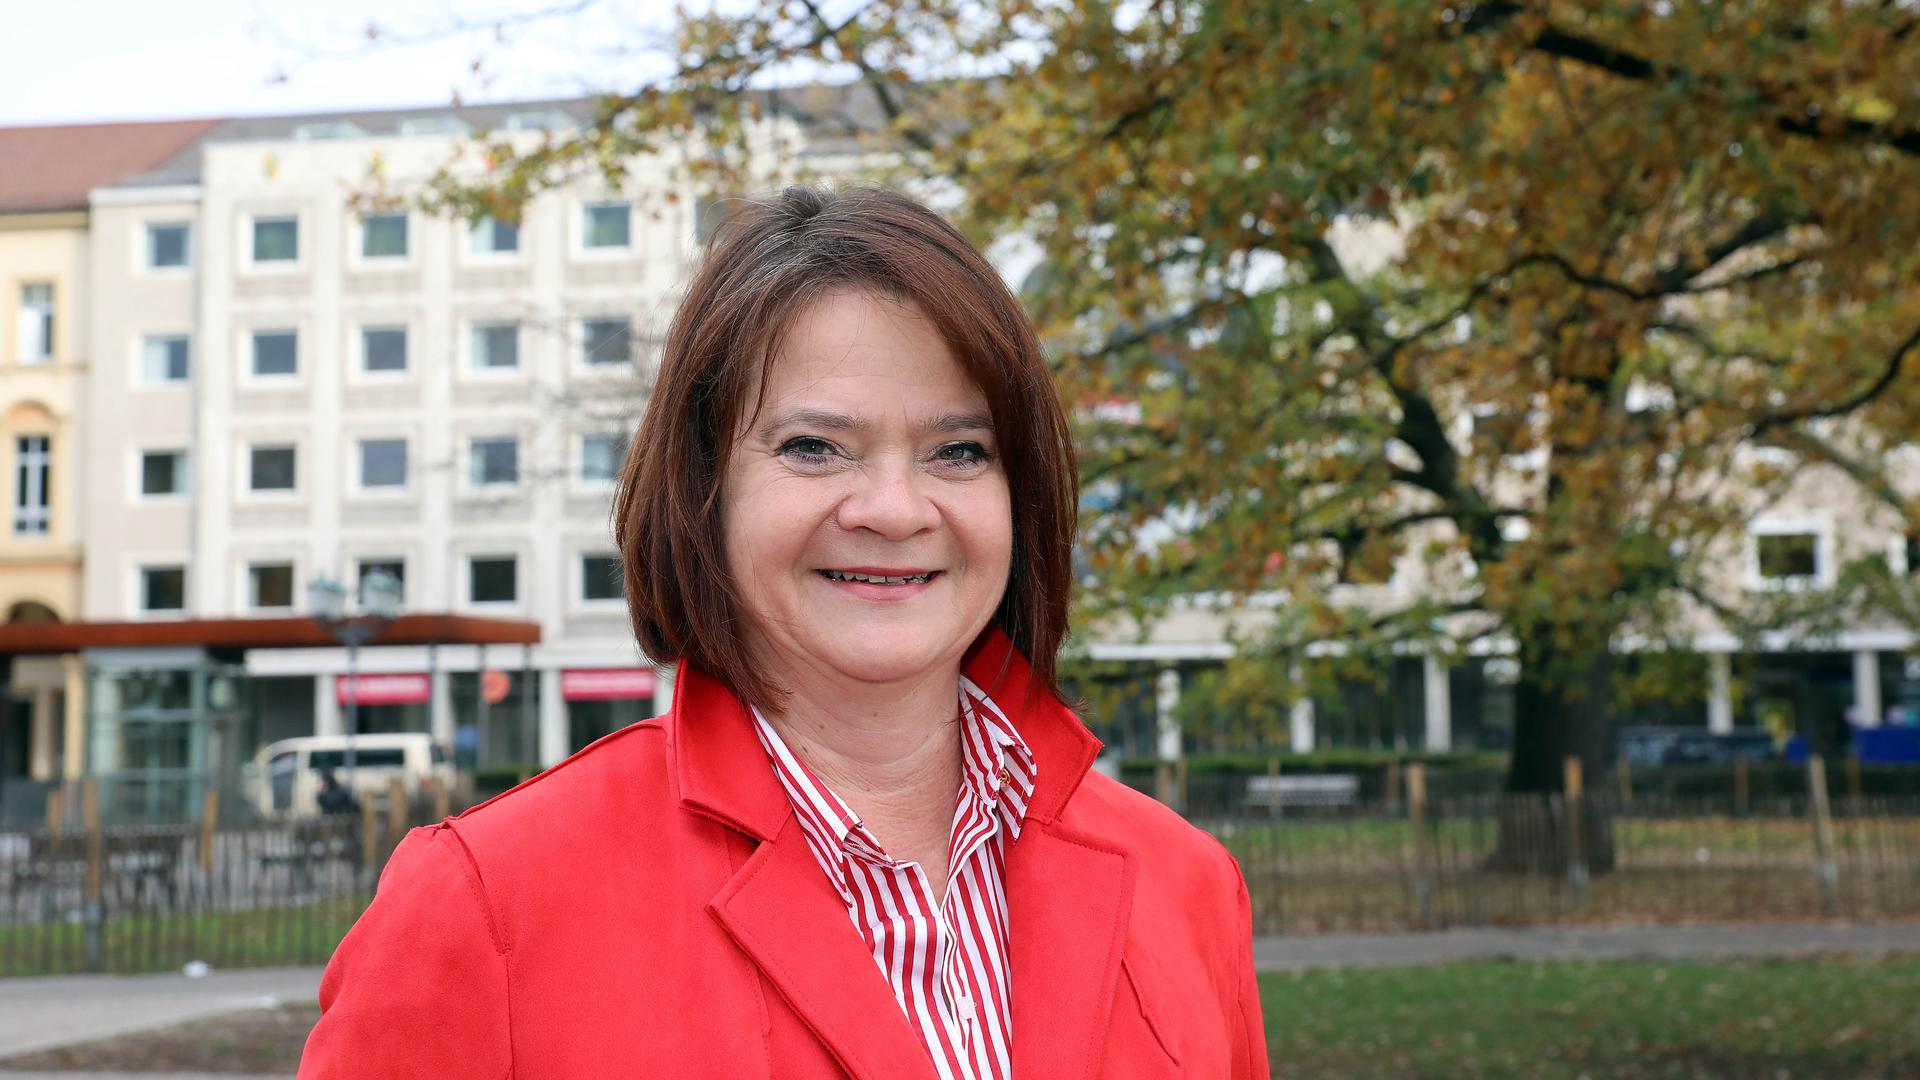 16.11.2020 Petra Lorenz / OB-Wahlkampf